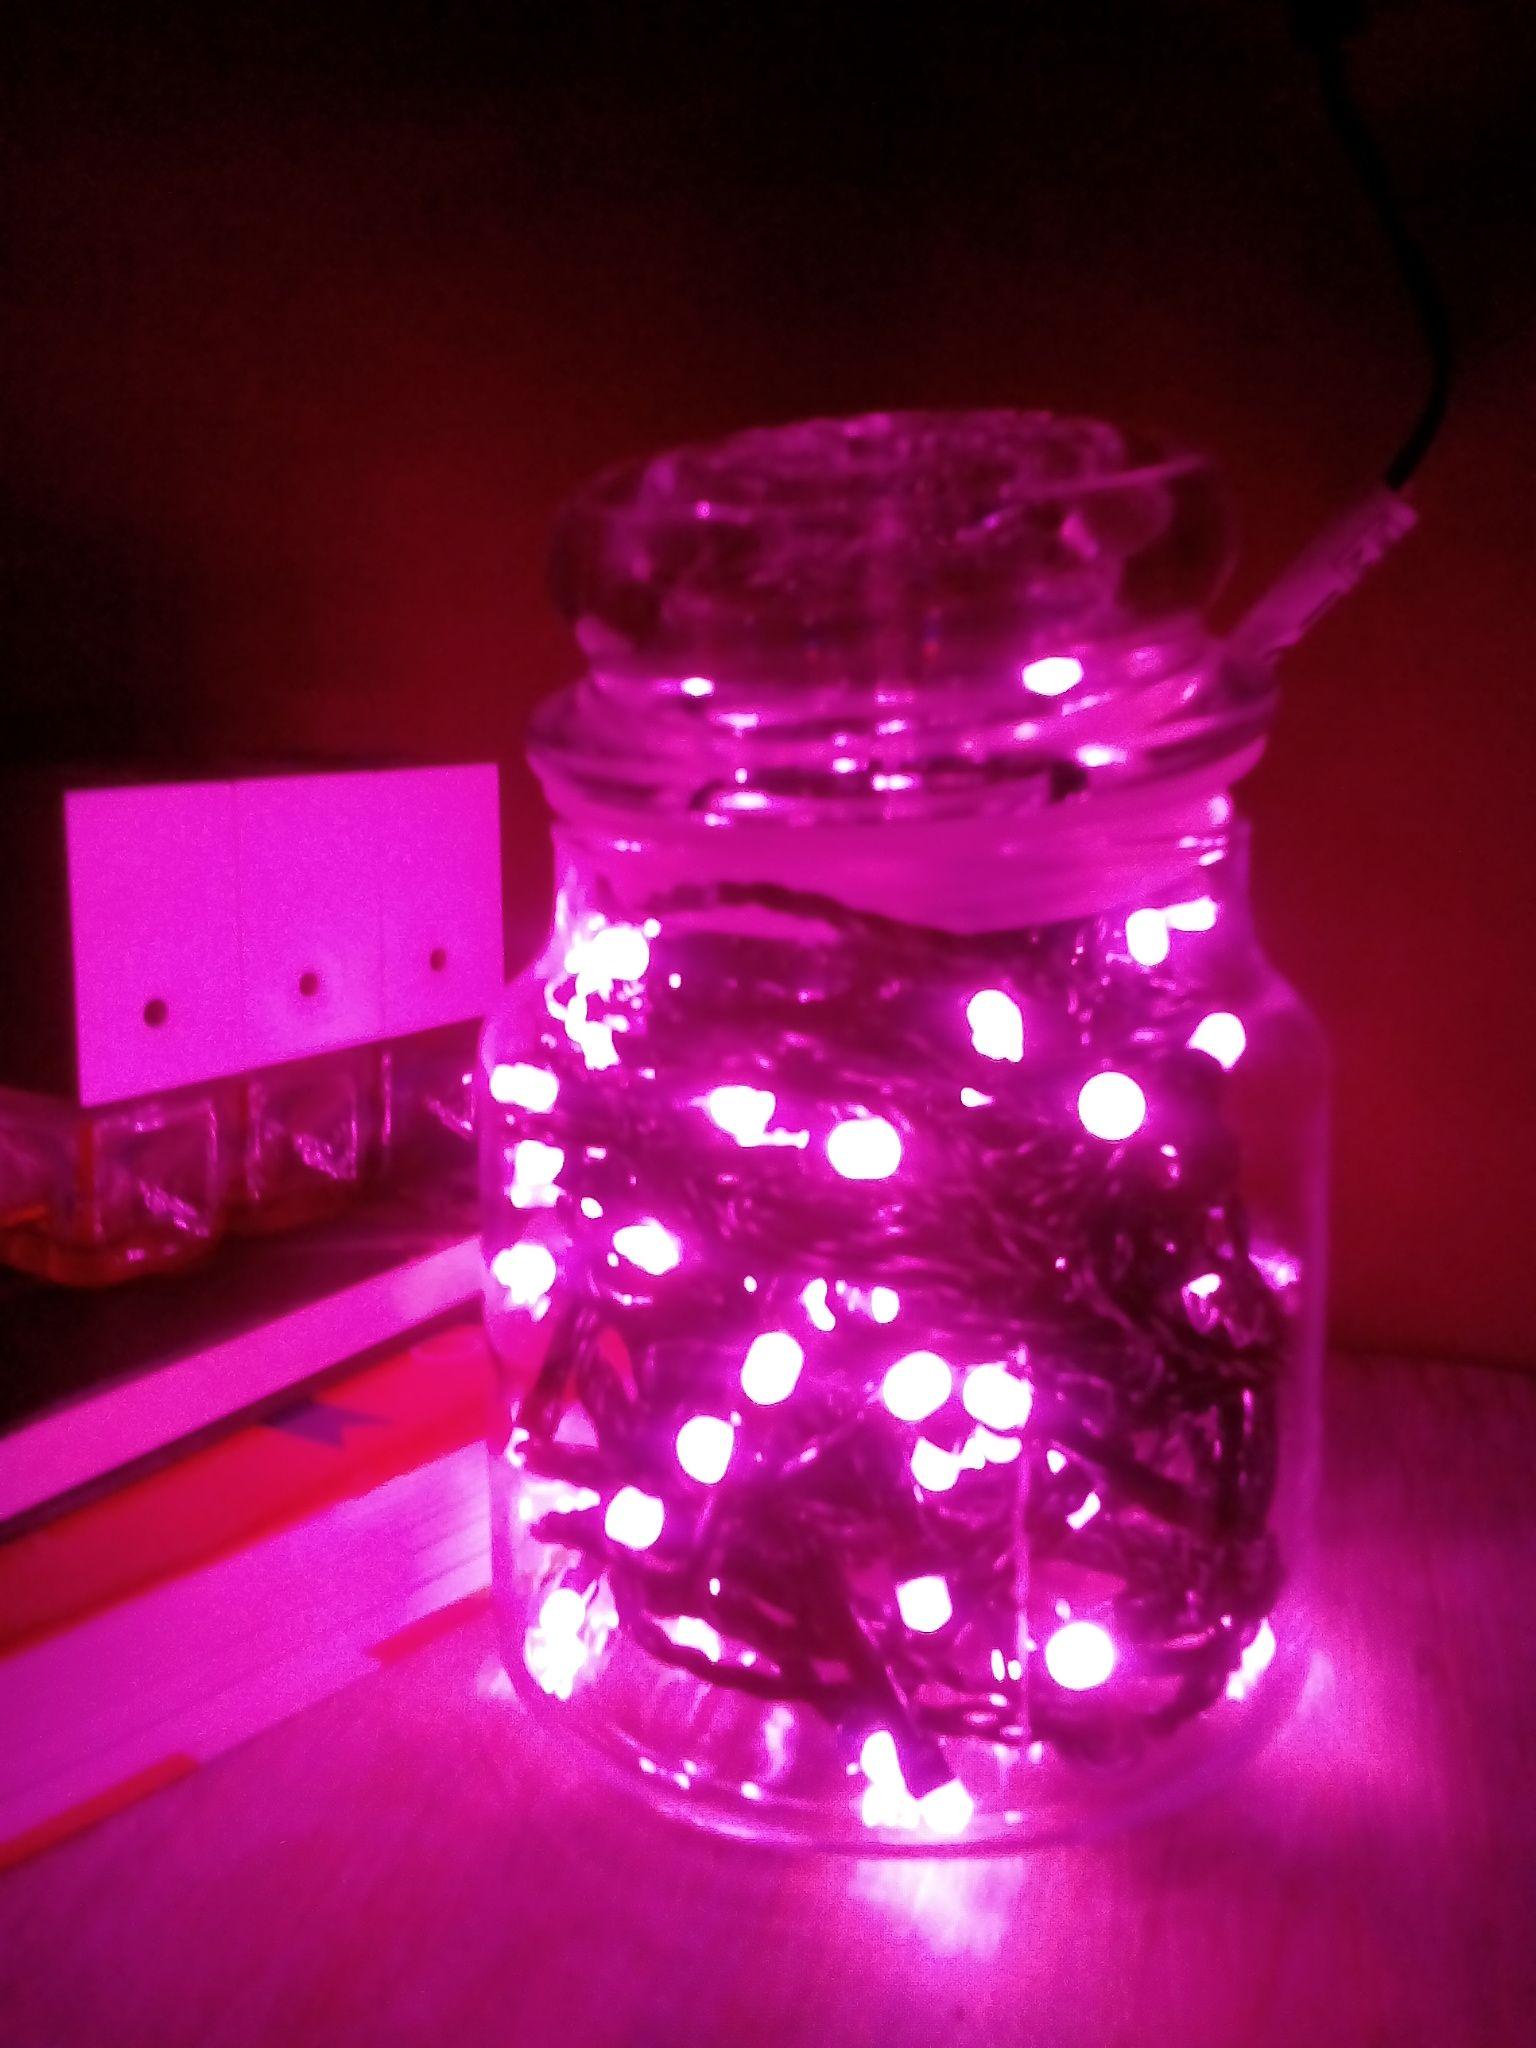 pink lights | Planos de fundo, Papeis de parede tumblr, Imagens tumblr